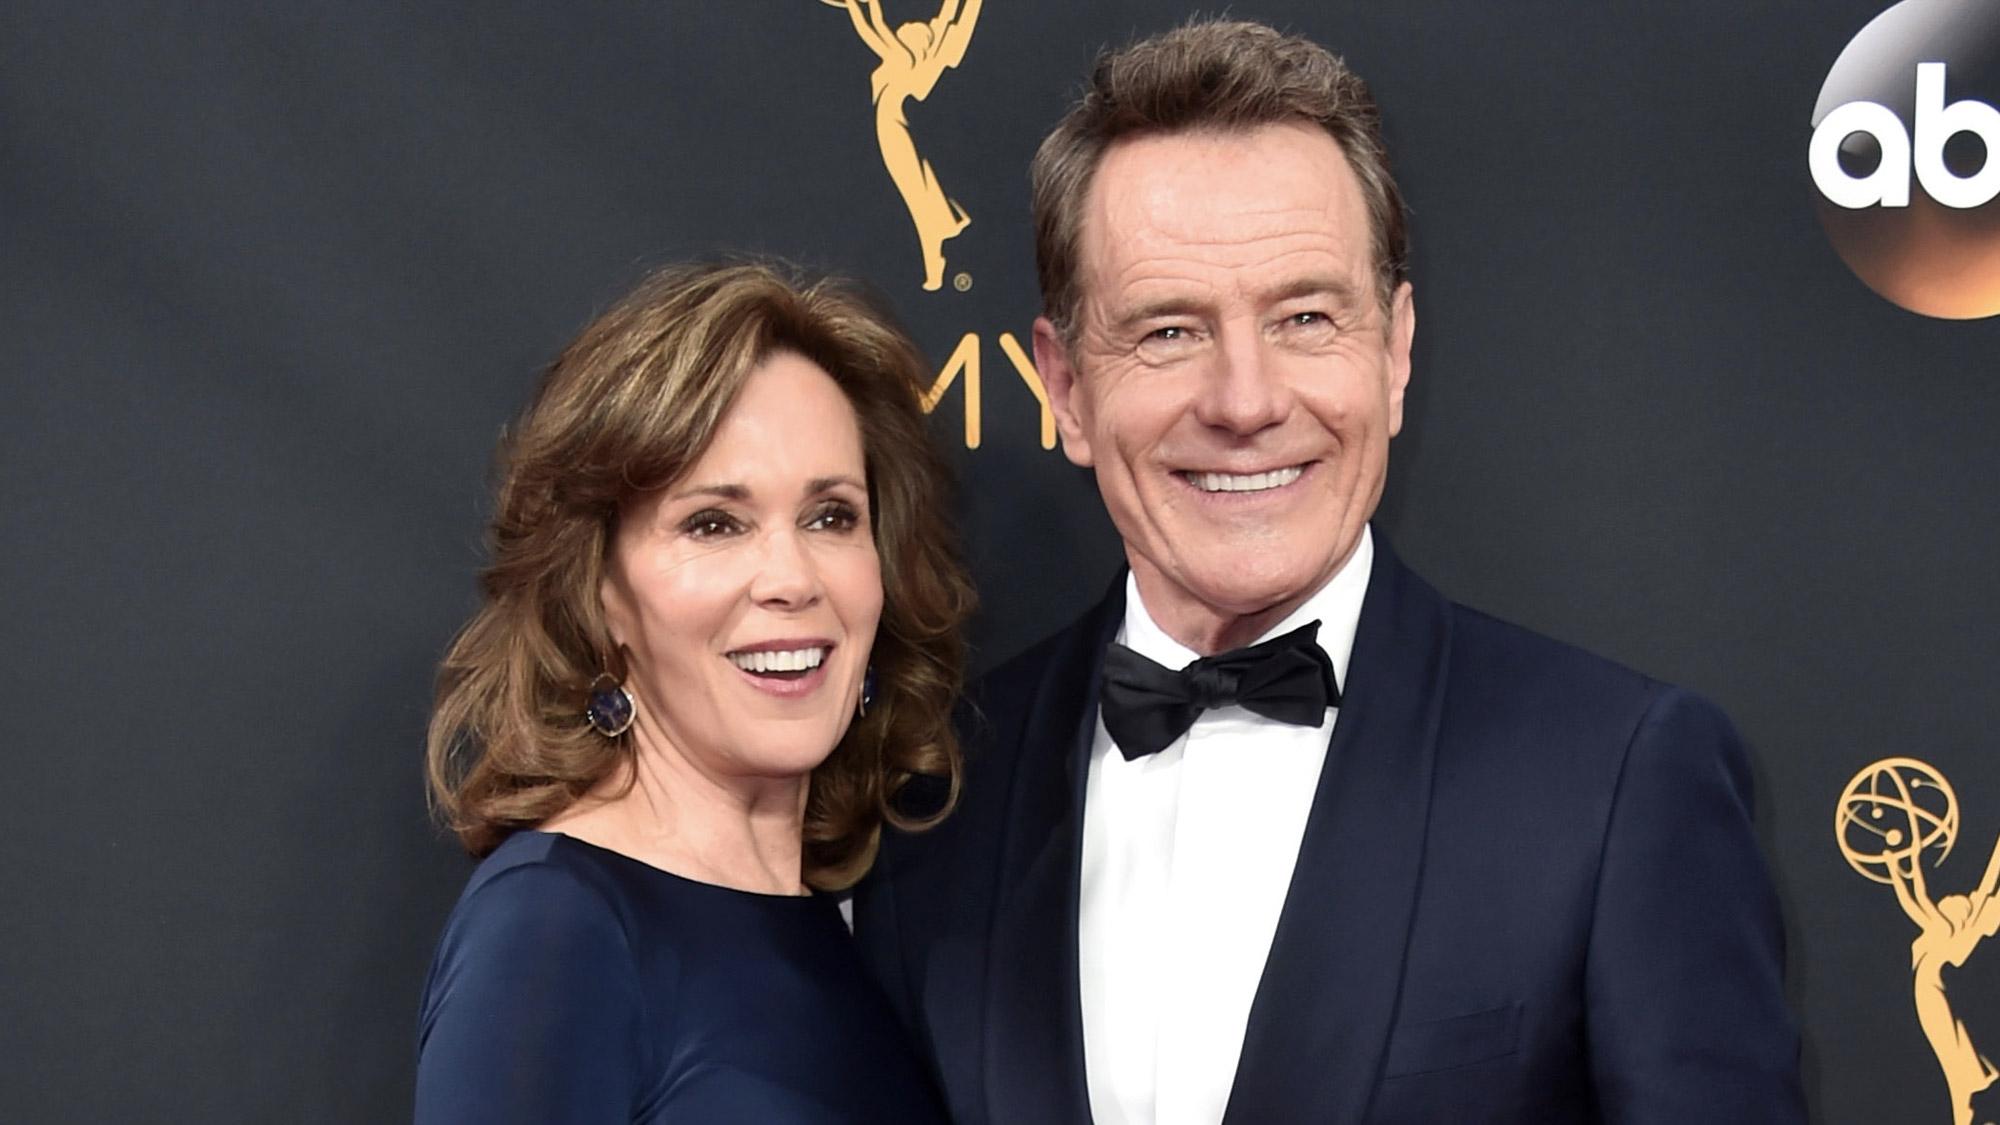 Robin Dearden et Bryan Cranston aux Emmy Awards 2016.